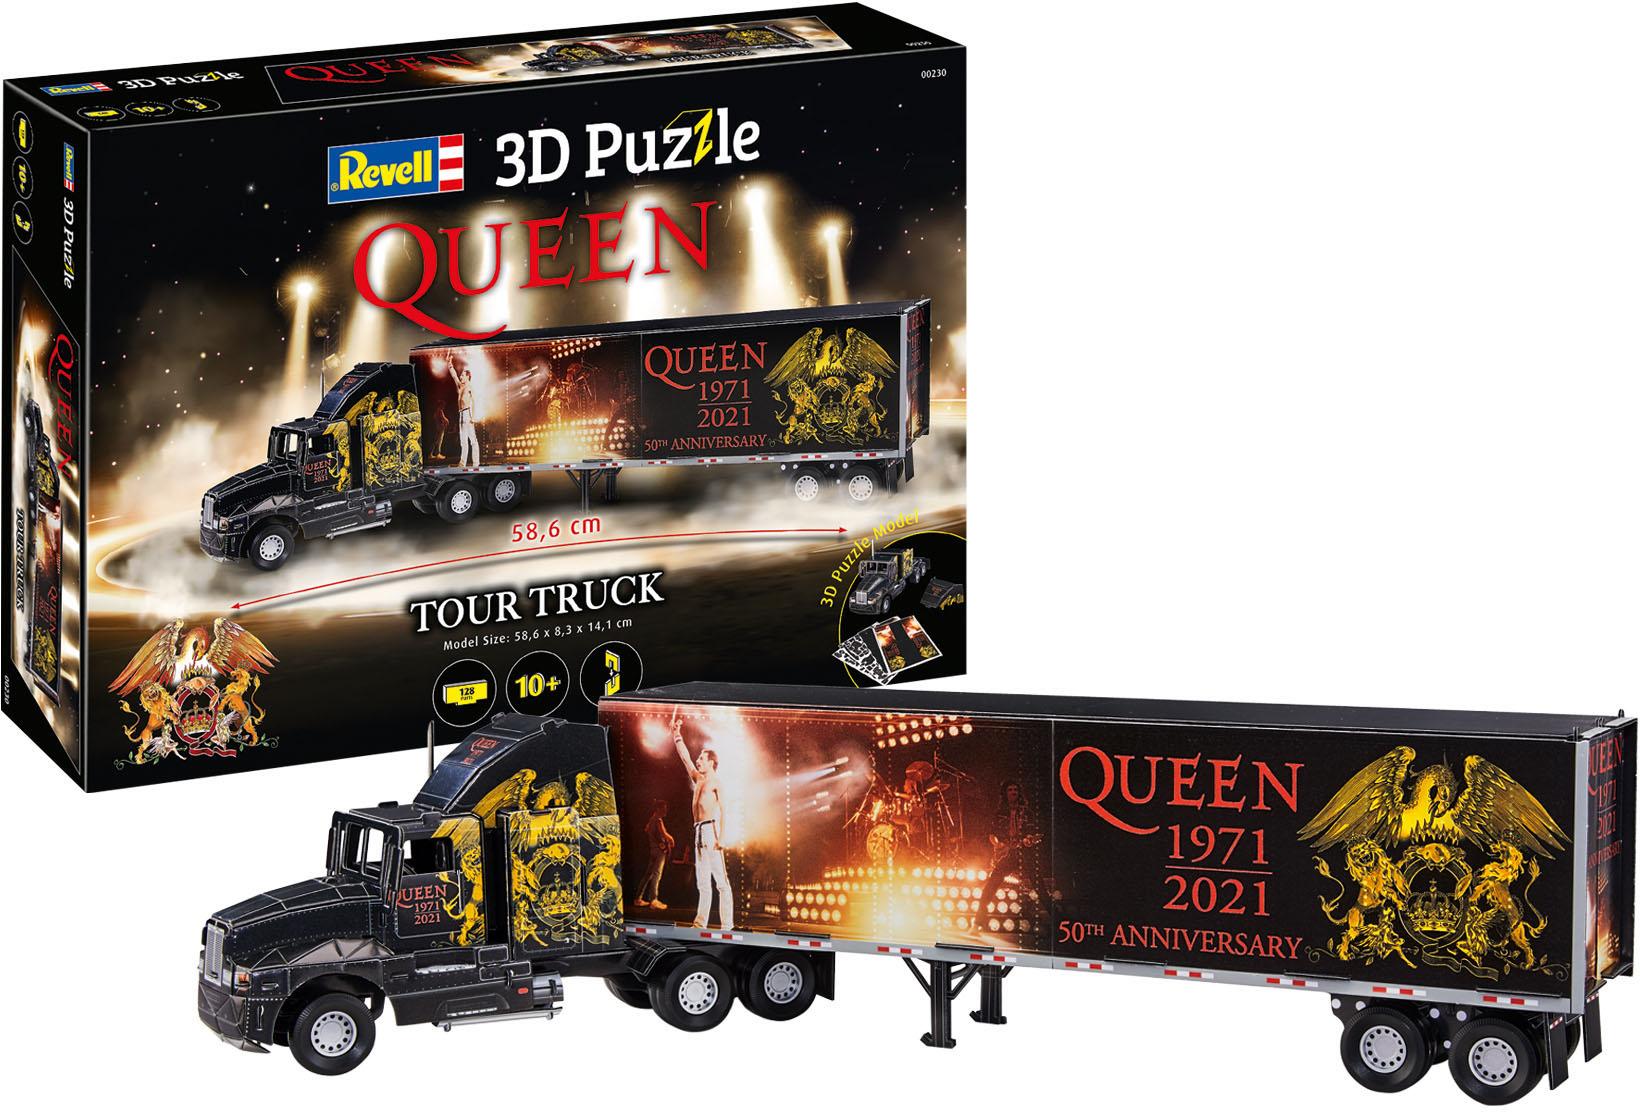 Revell 3D-Puzzle Tour-Truck Queen schwarz Kinder 3D Puzzle Gesellschaftsspiele